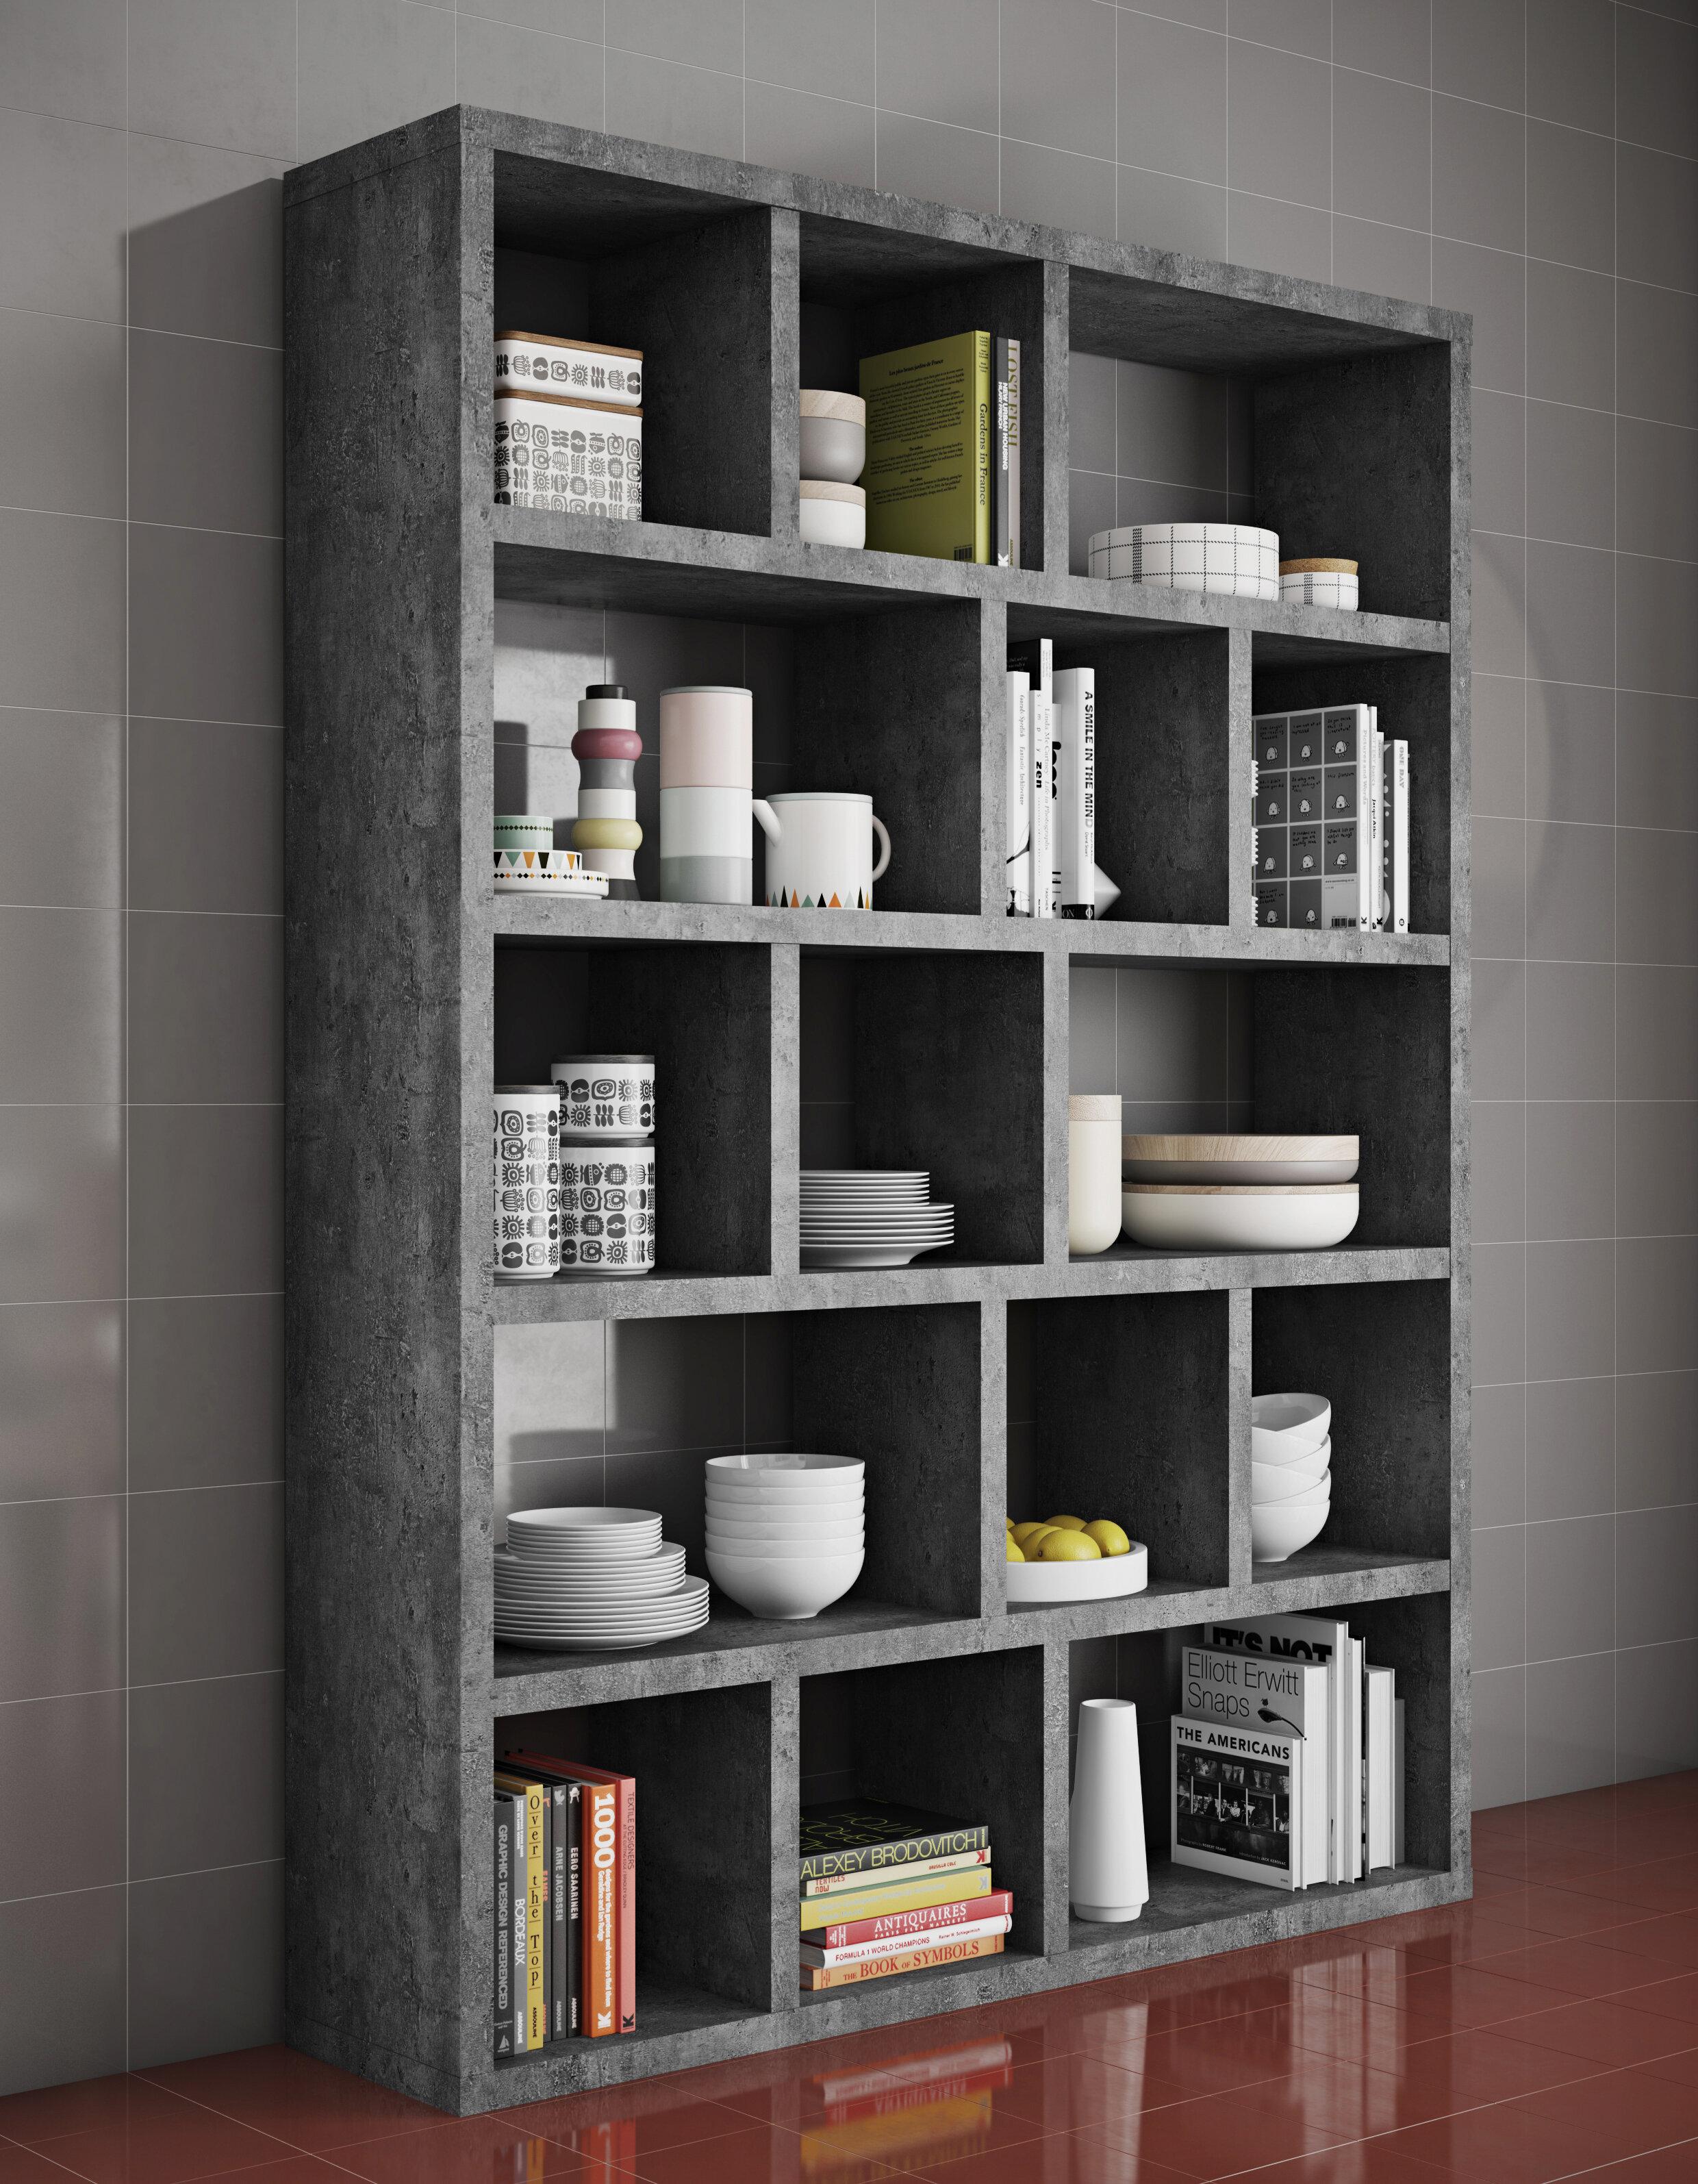 wayfair hekimhan co reviews pdp bookcase bookshelf letter furniture wharf borough uk